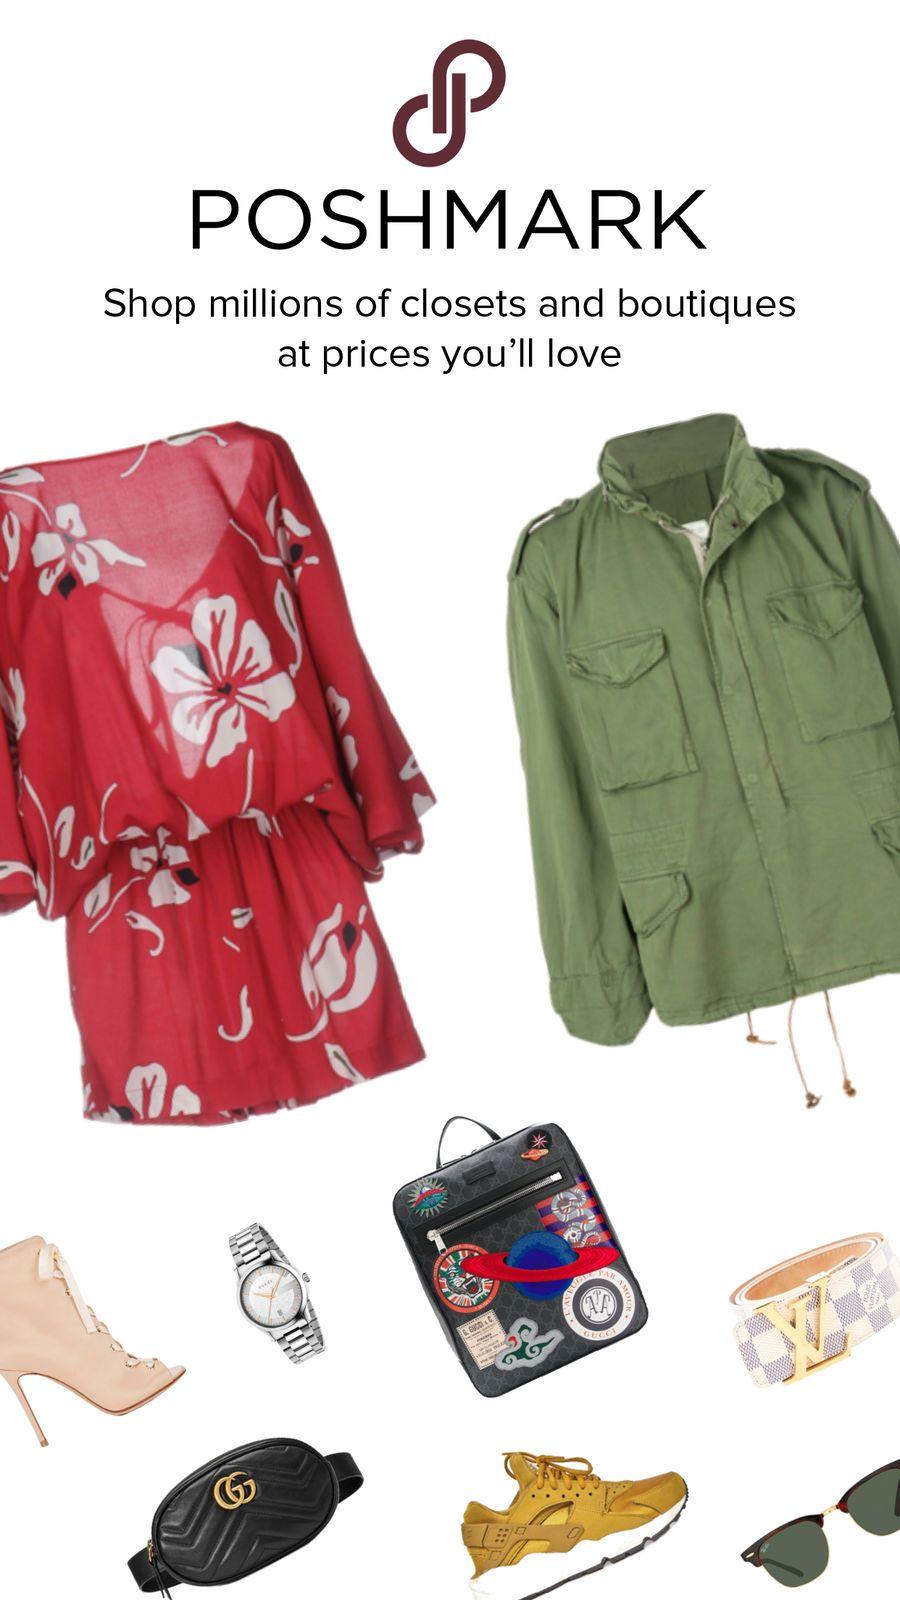 Poshmark appsappappstoreios Shopping, Fashion